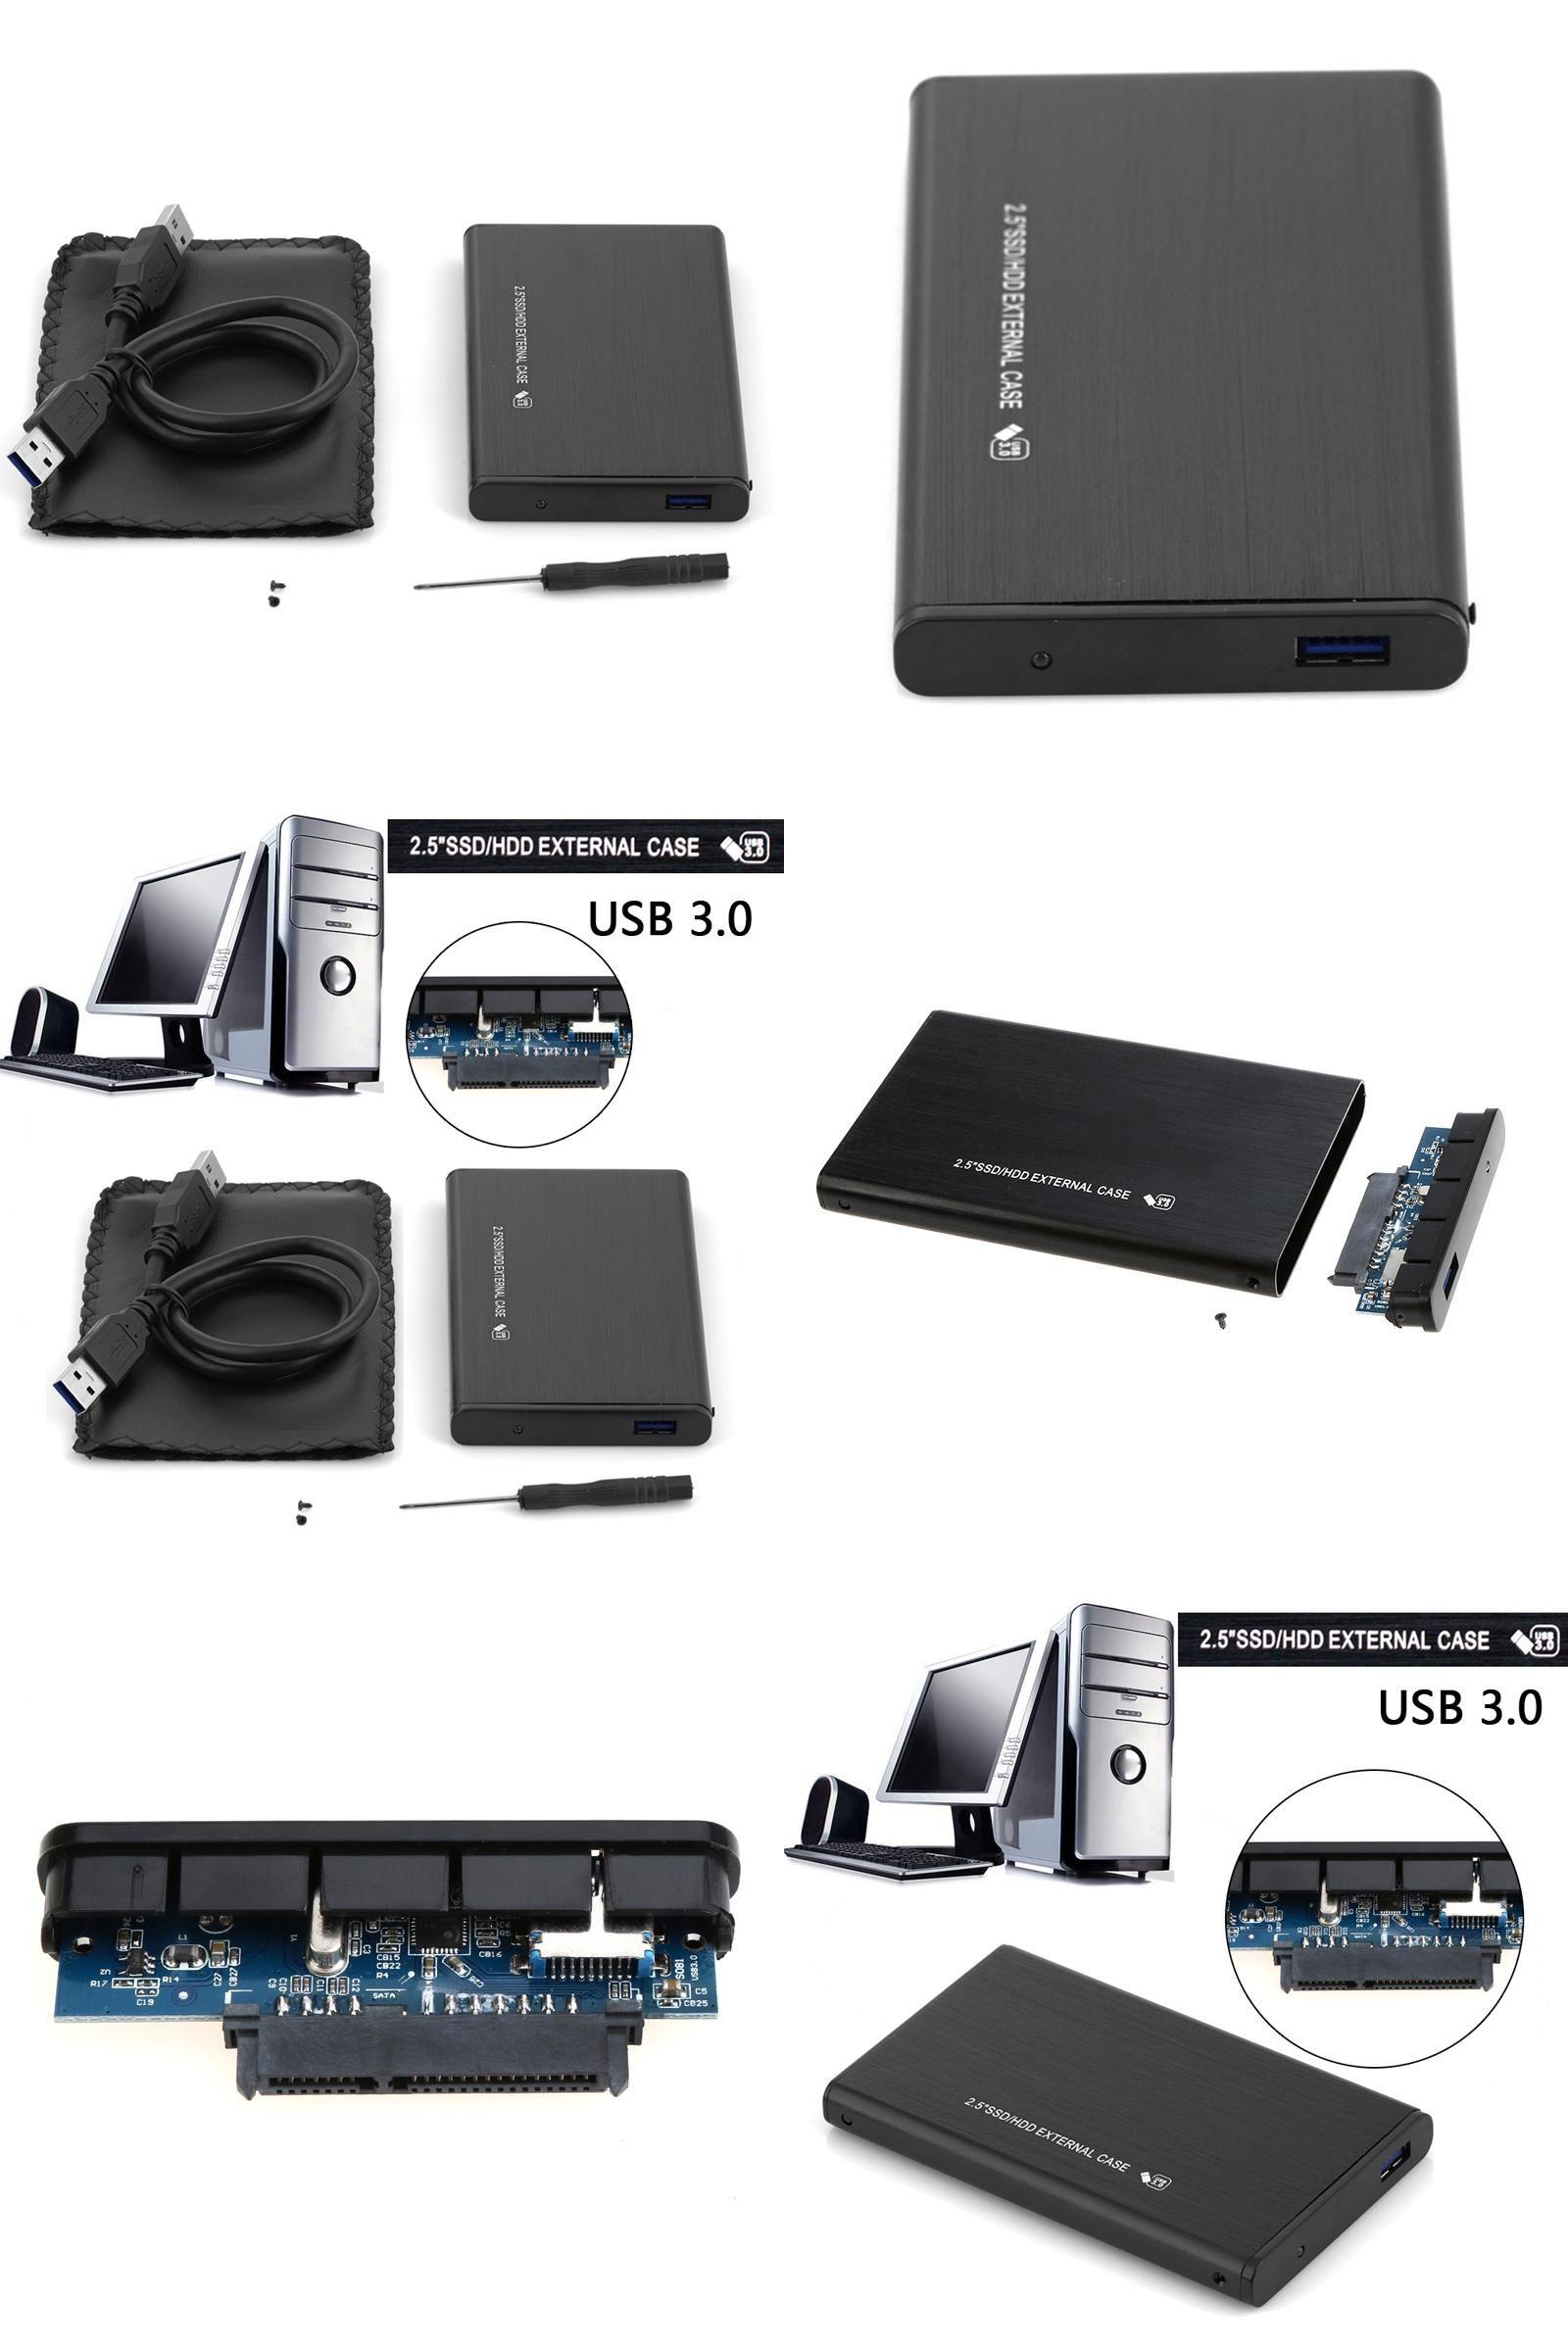 95 25 External Hdd Hard Disk Drive Usb 20 Sata Orico 2577u3 Inch Usb30 Enclosure Visit To Buy High Quality Ssd Hd Box 30